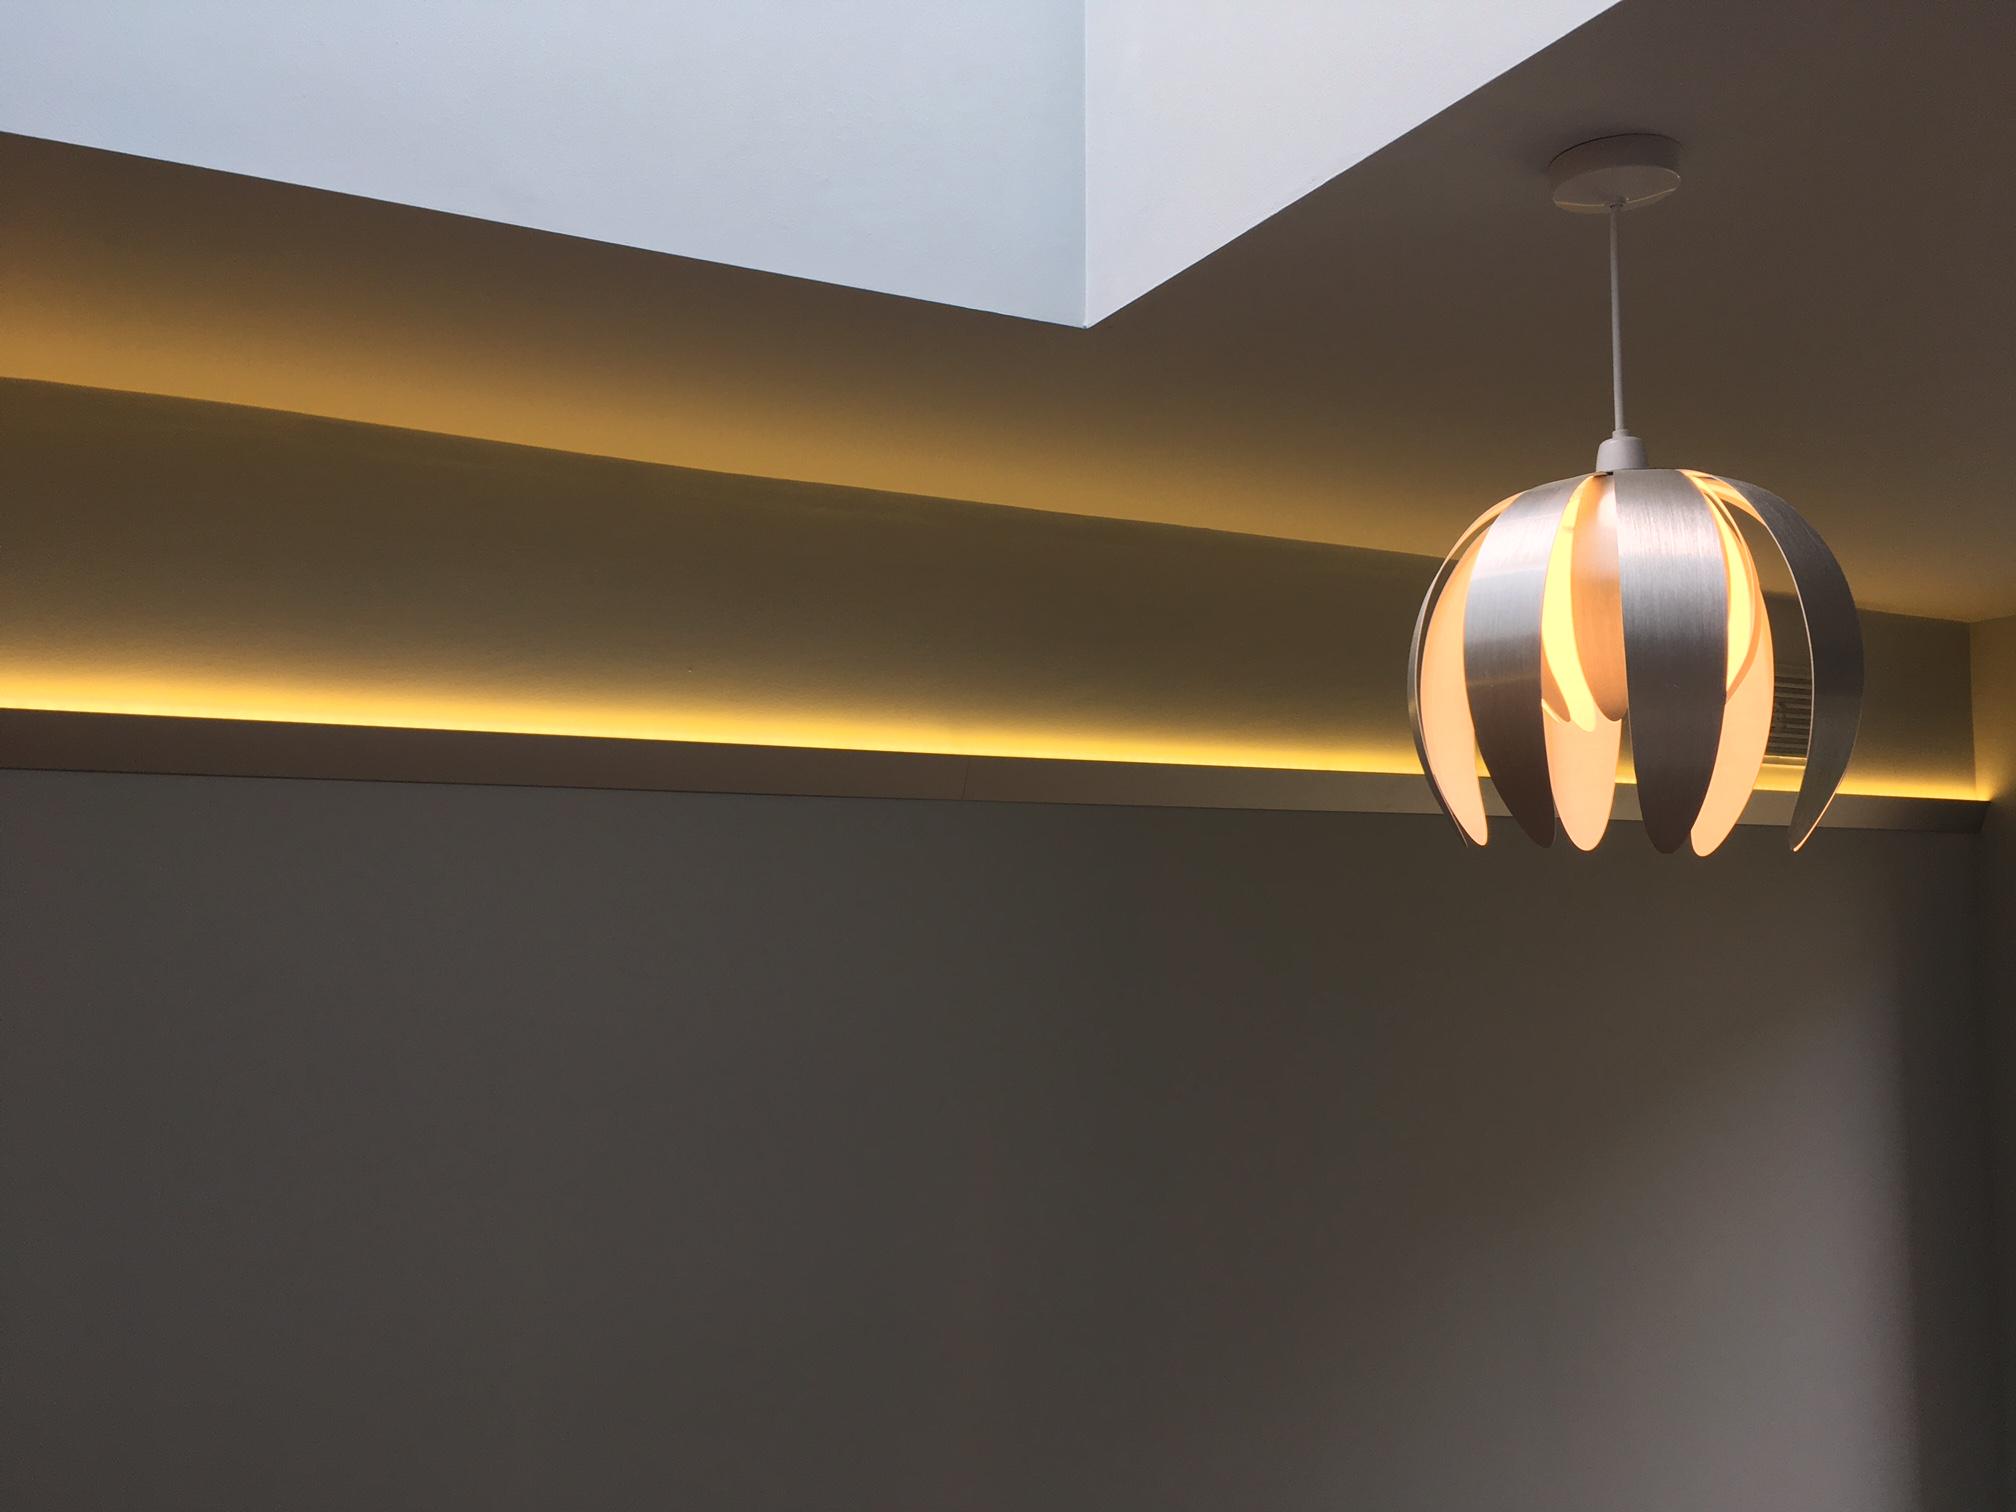 Architect_Interior_Design_Make_Light_extend_Renovate.JPG